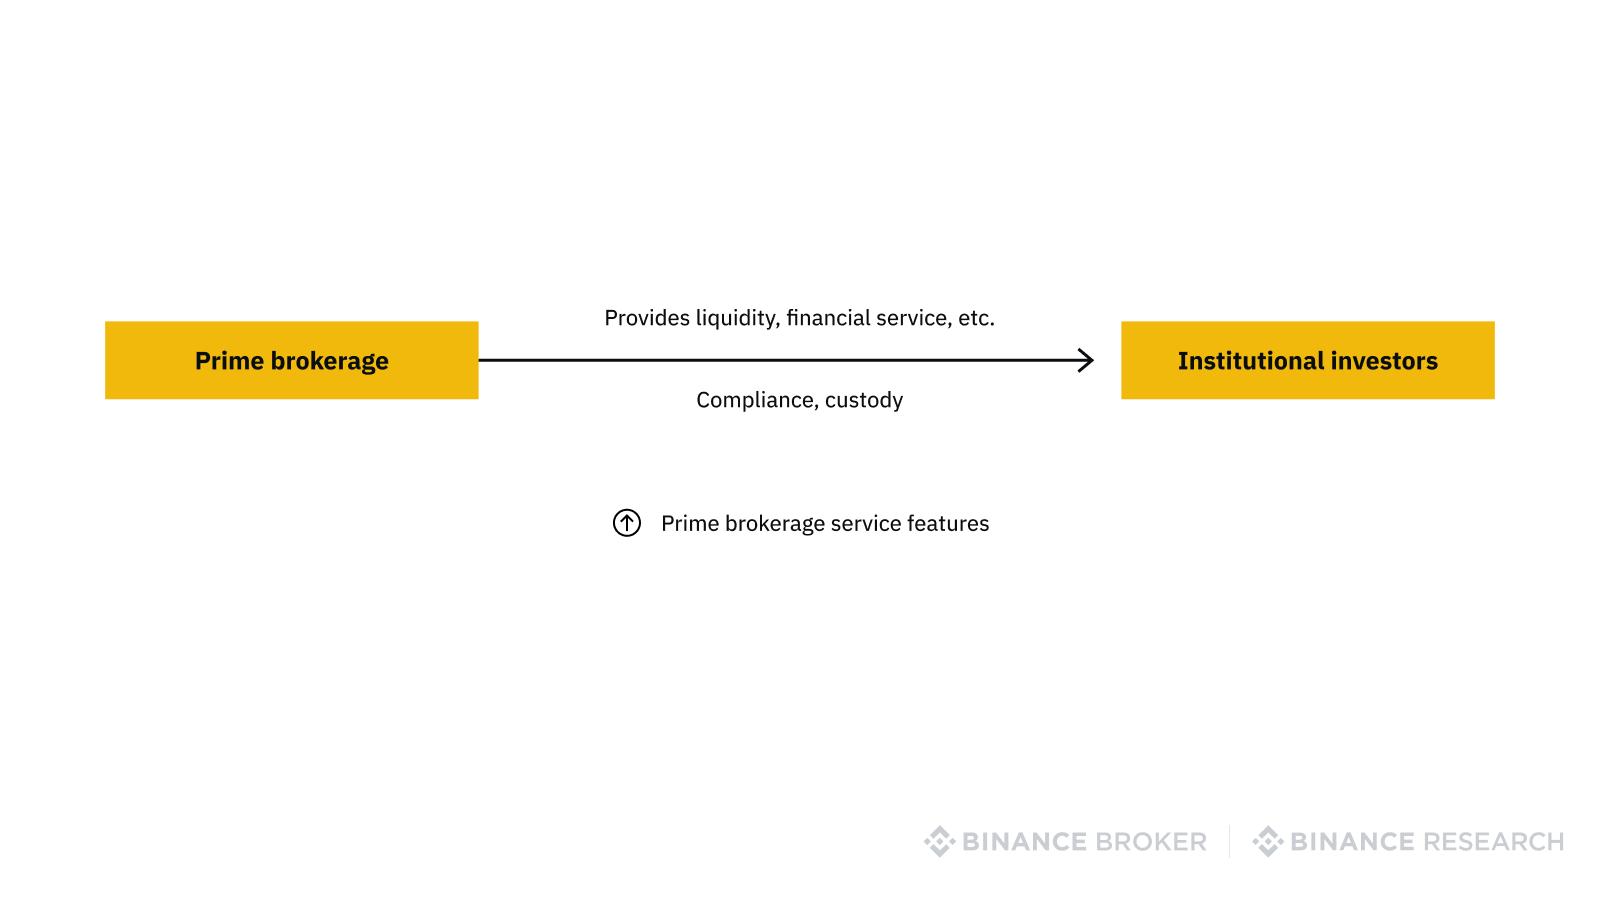 Relationship between prime brokerage and institutional investors